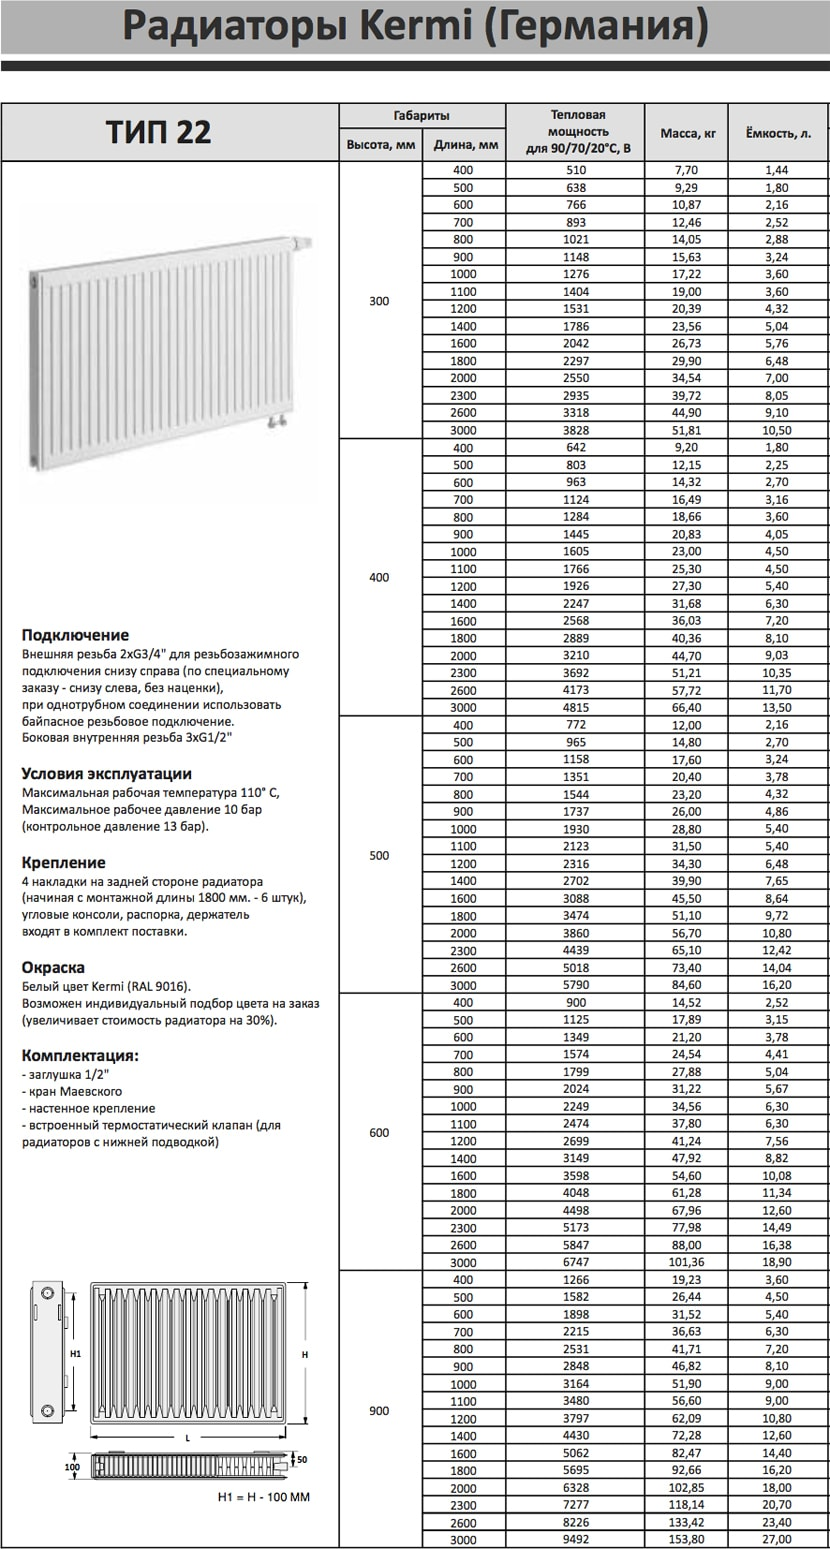 Размер на KeRMI FKo   225001600